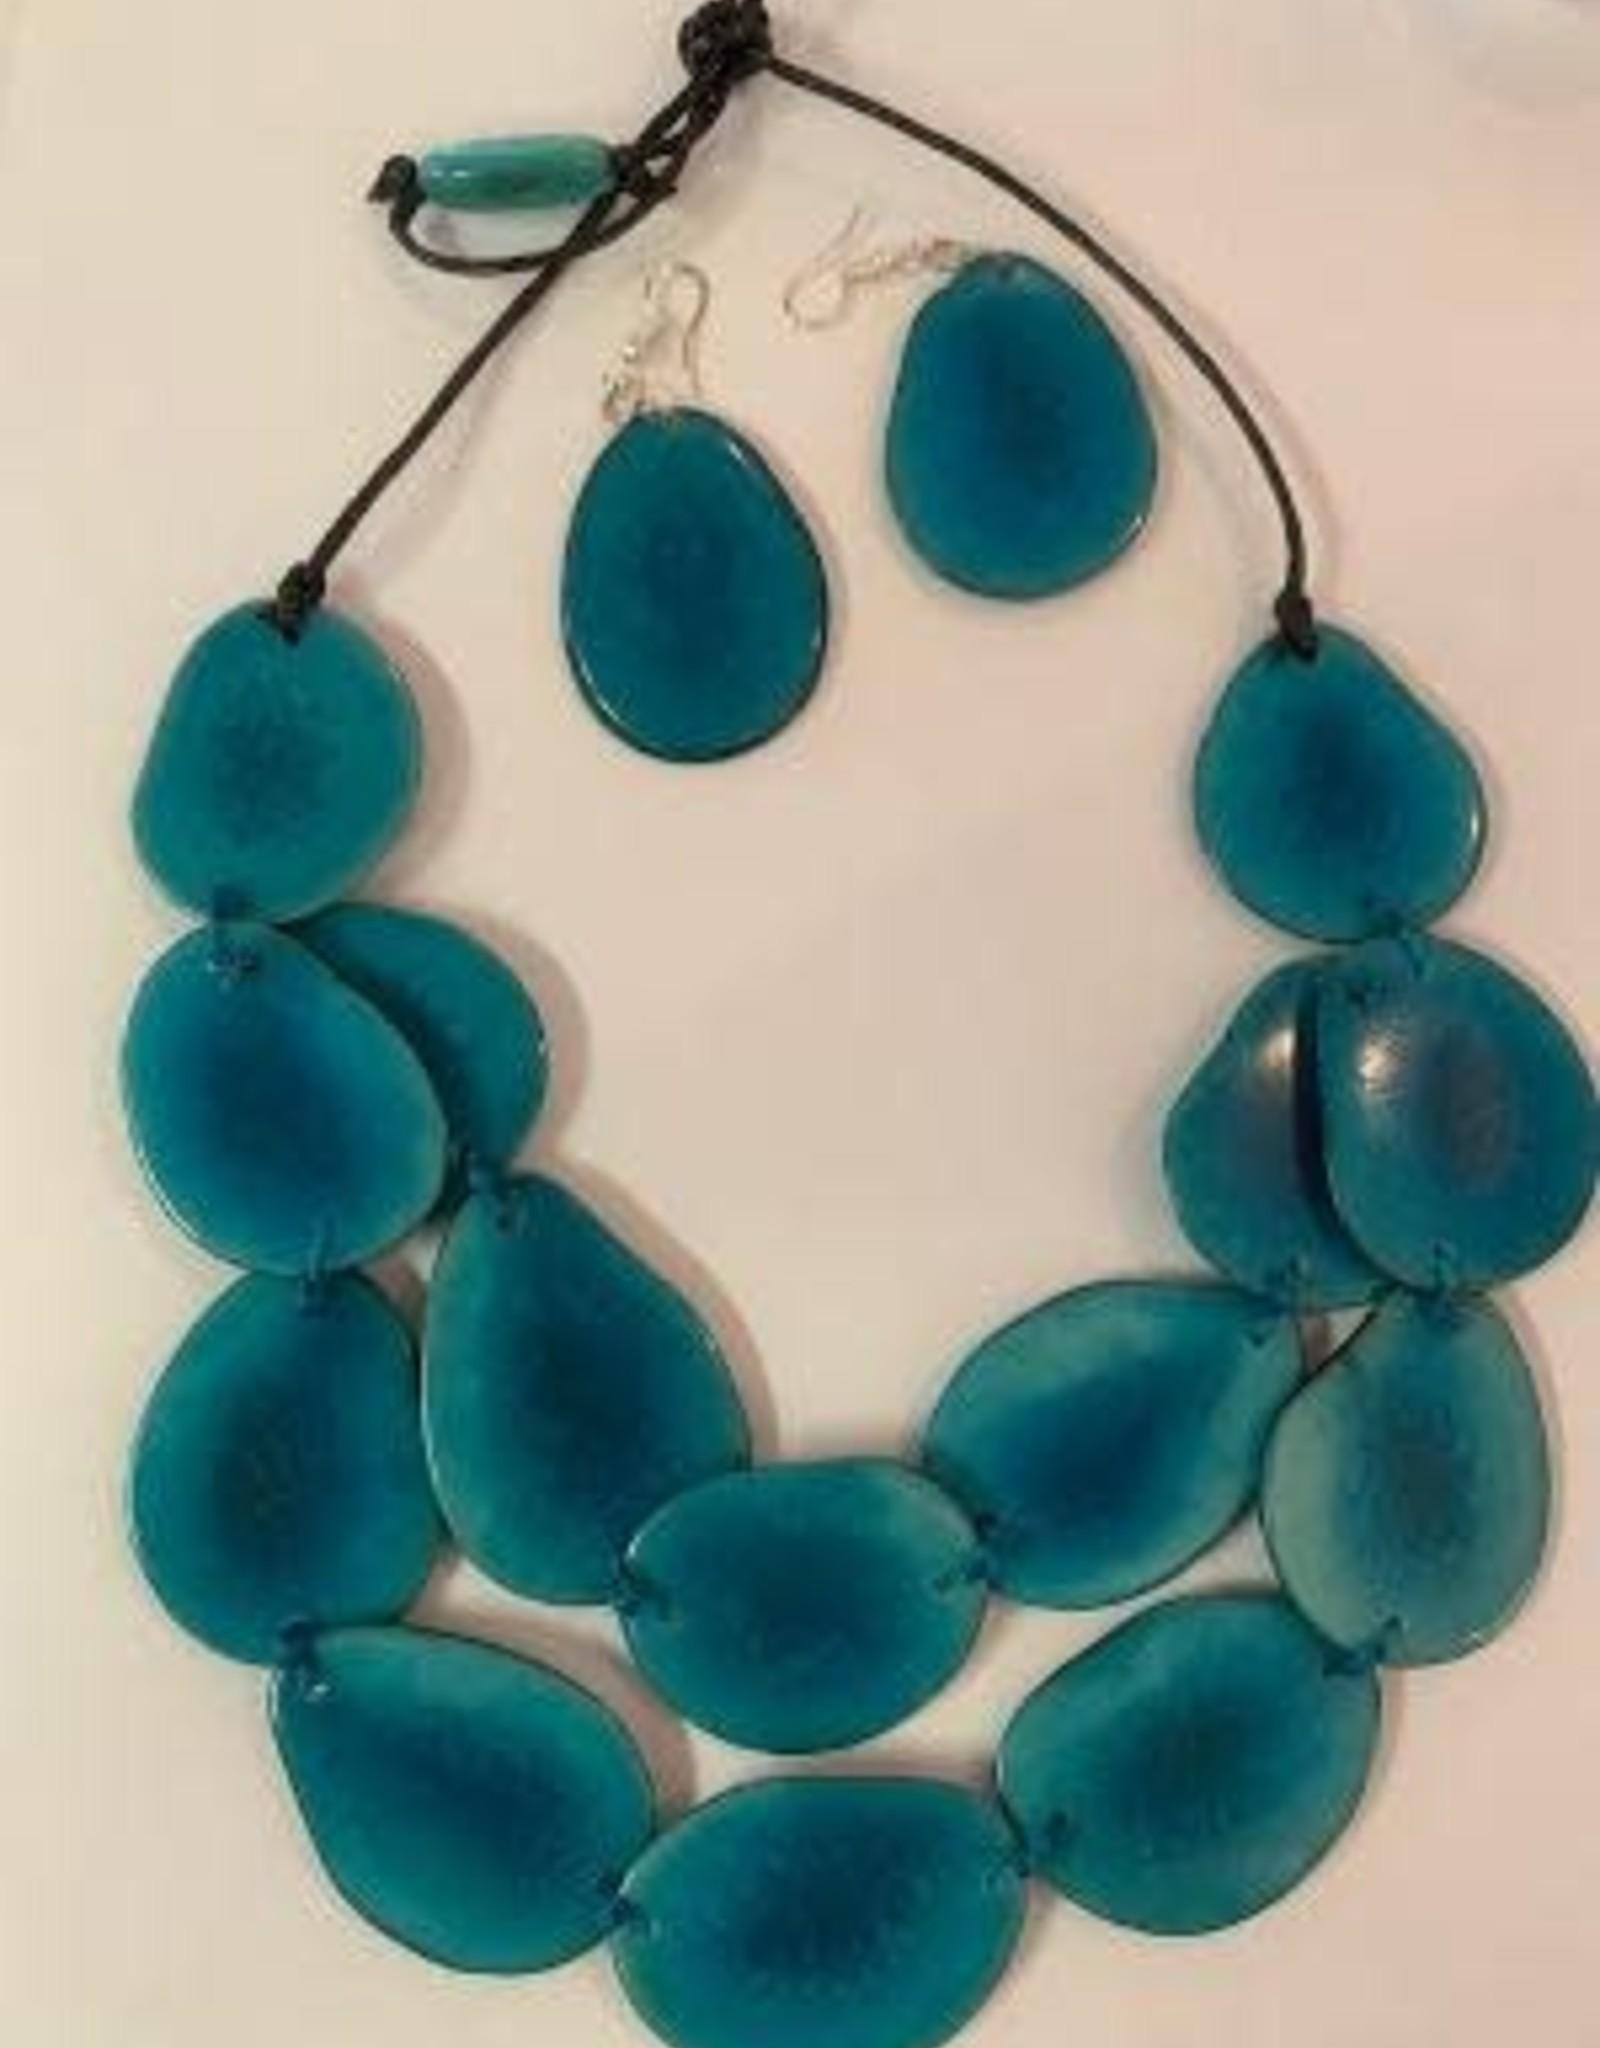 Double Slice Tagua Necklace and Earrings, Aqua